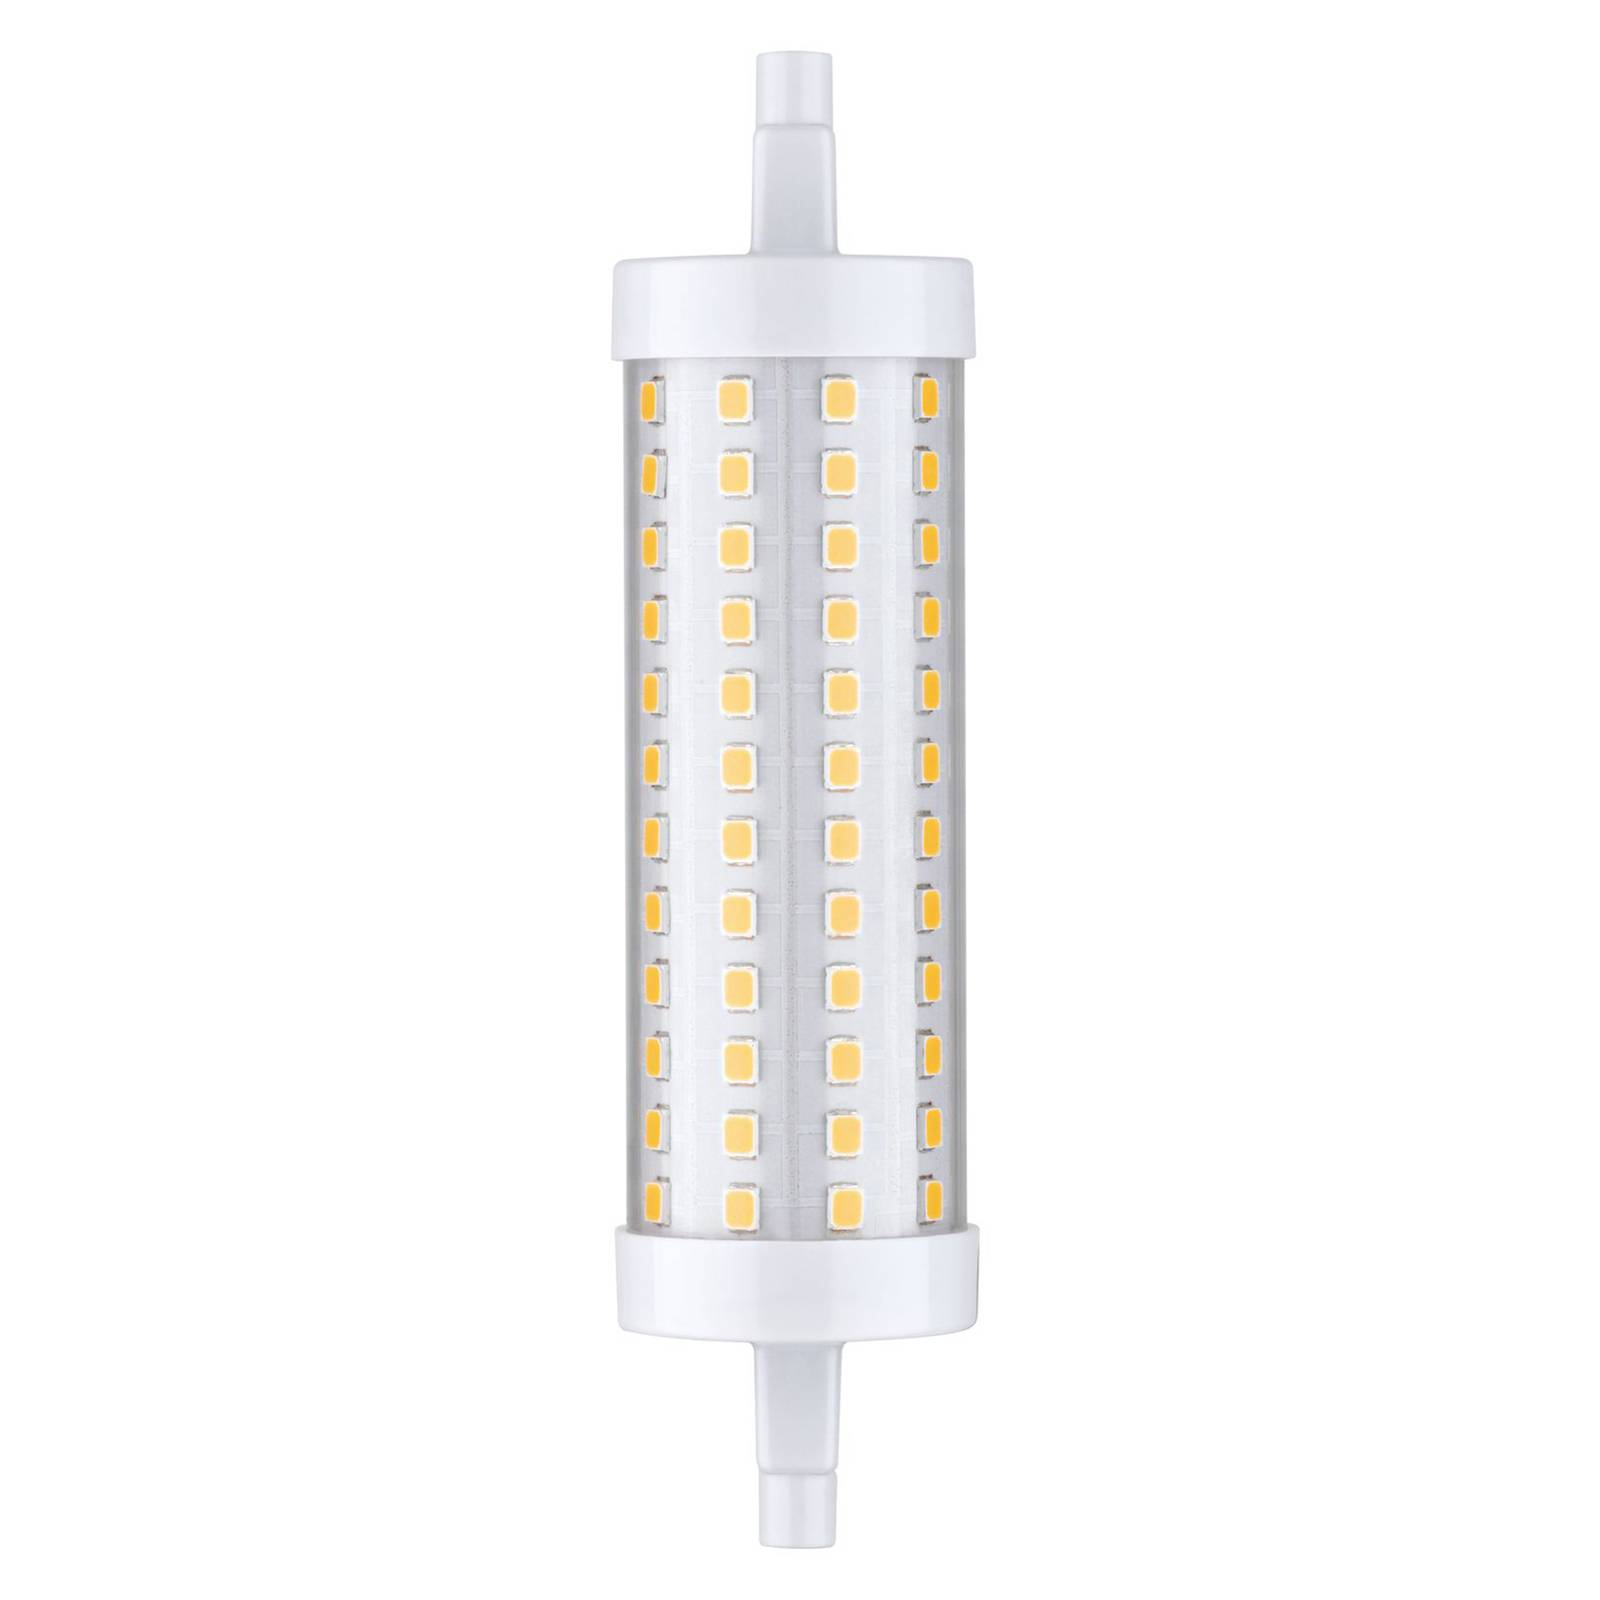 Paulmann-LED-lamppu R7s 118 mm 13W 1 521 lm